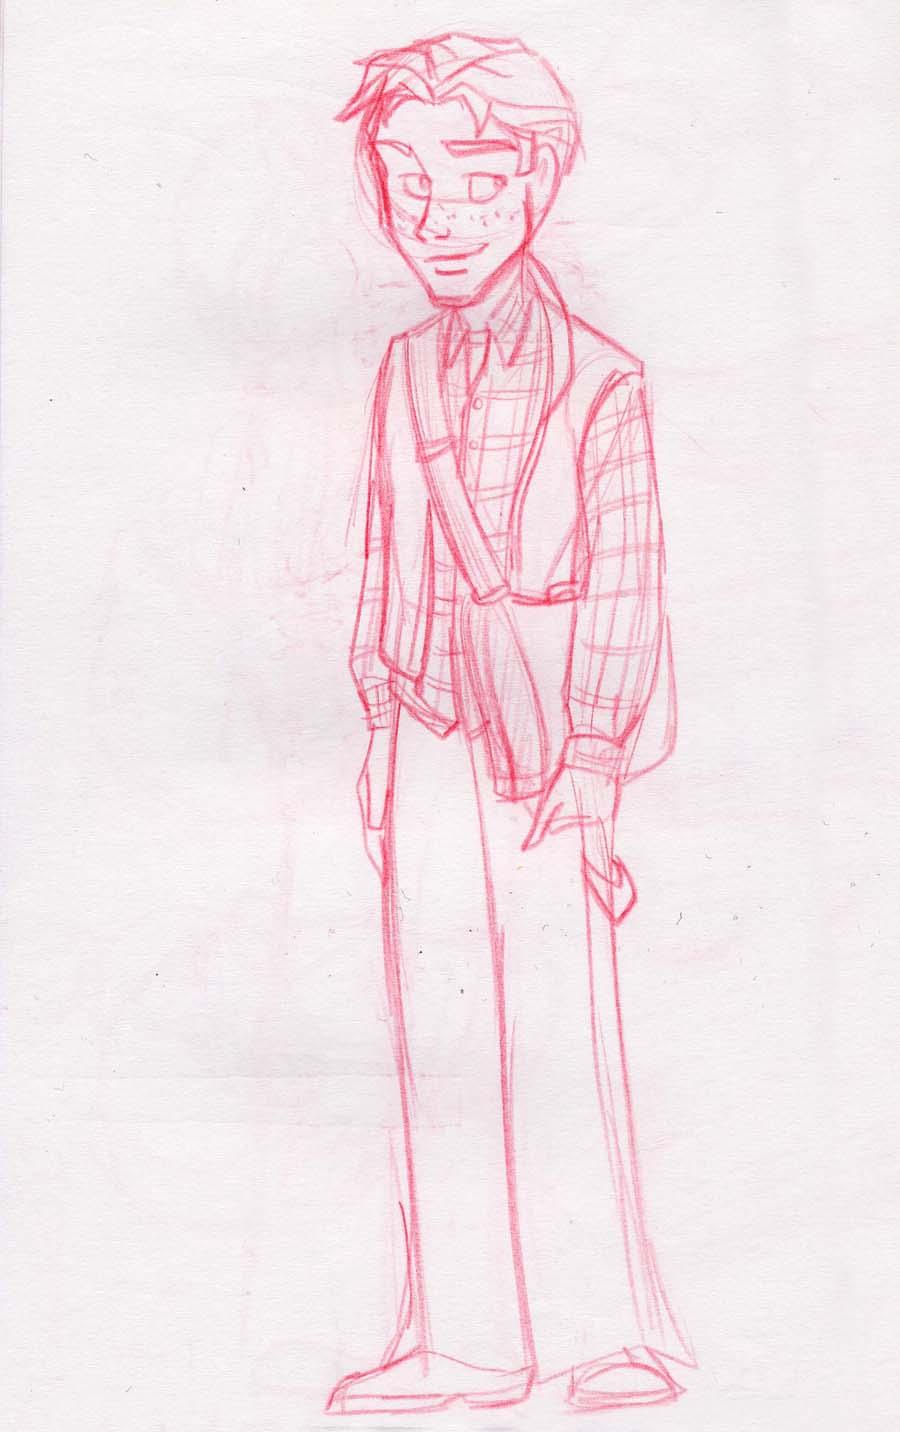 Ron Weasley at Hogwarts University